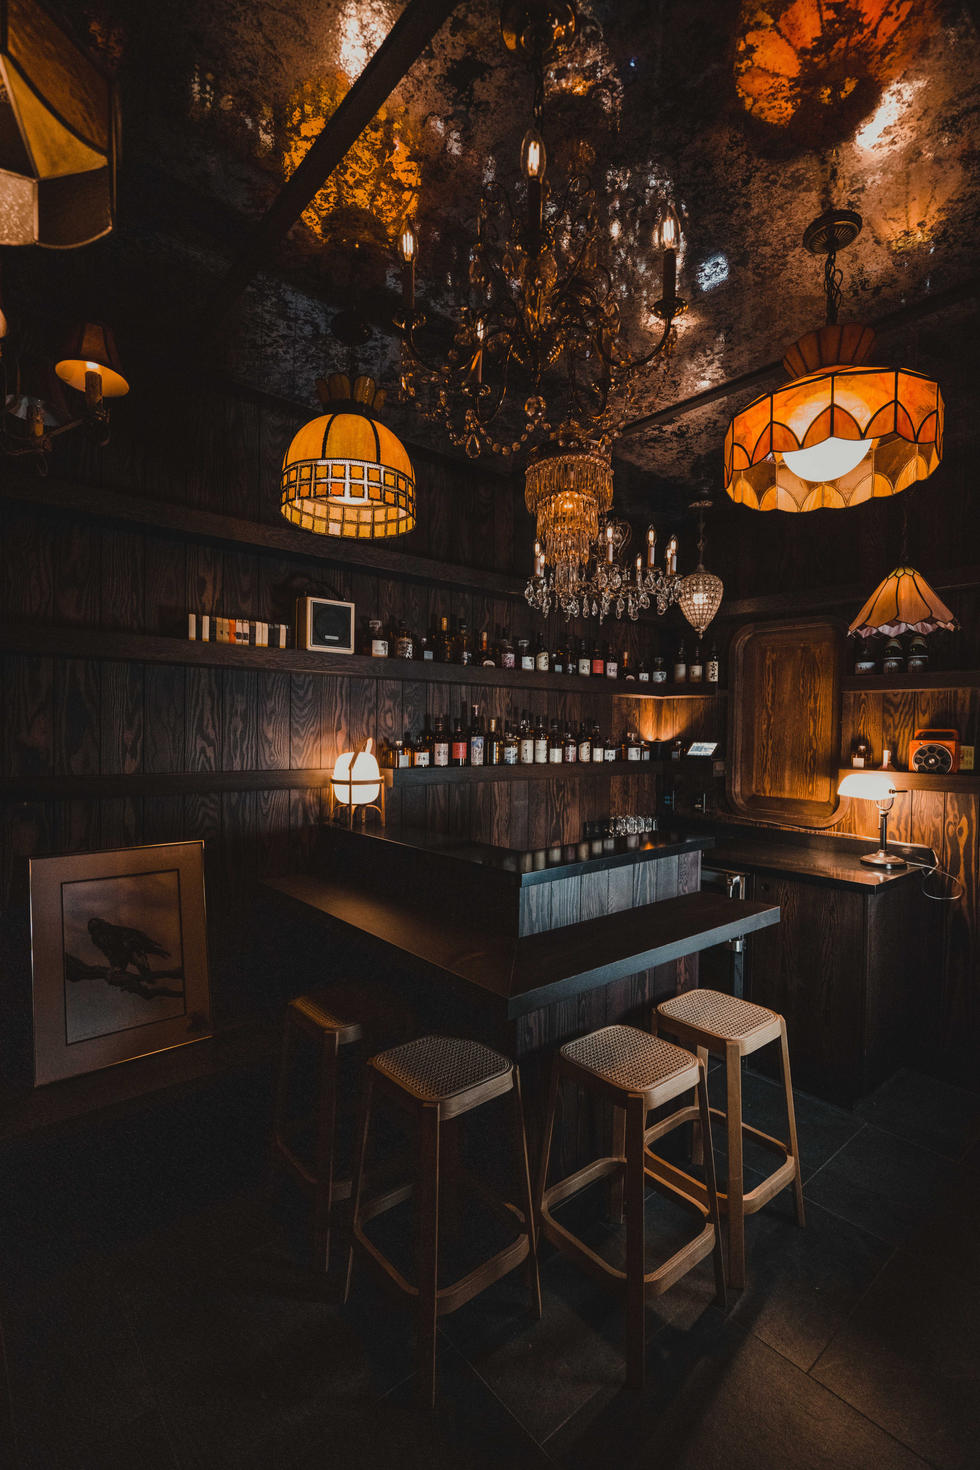 The Tiny Bar